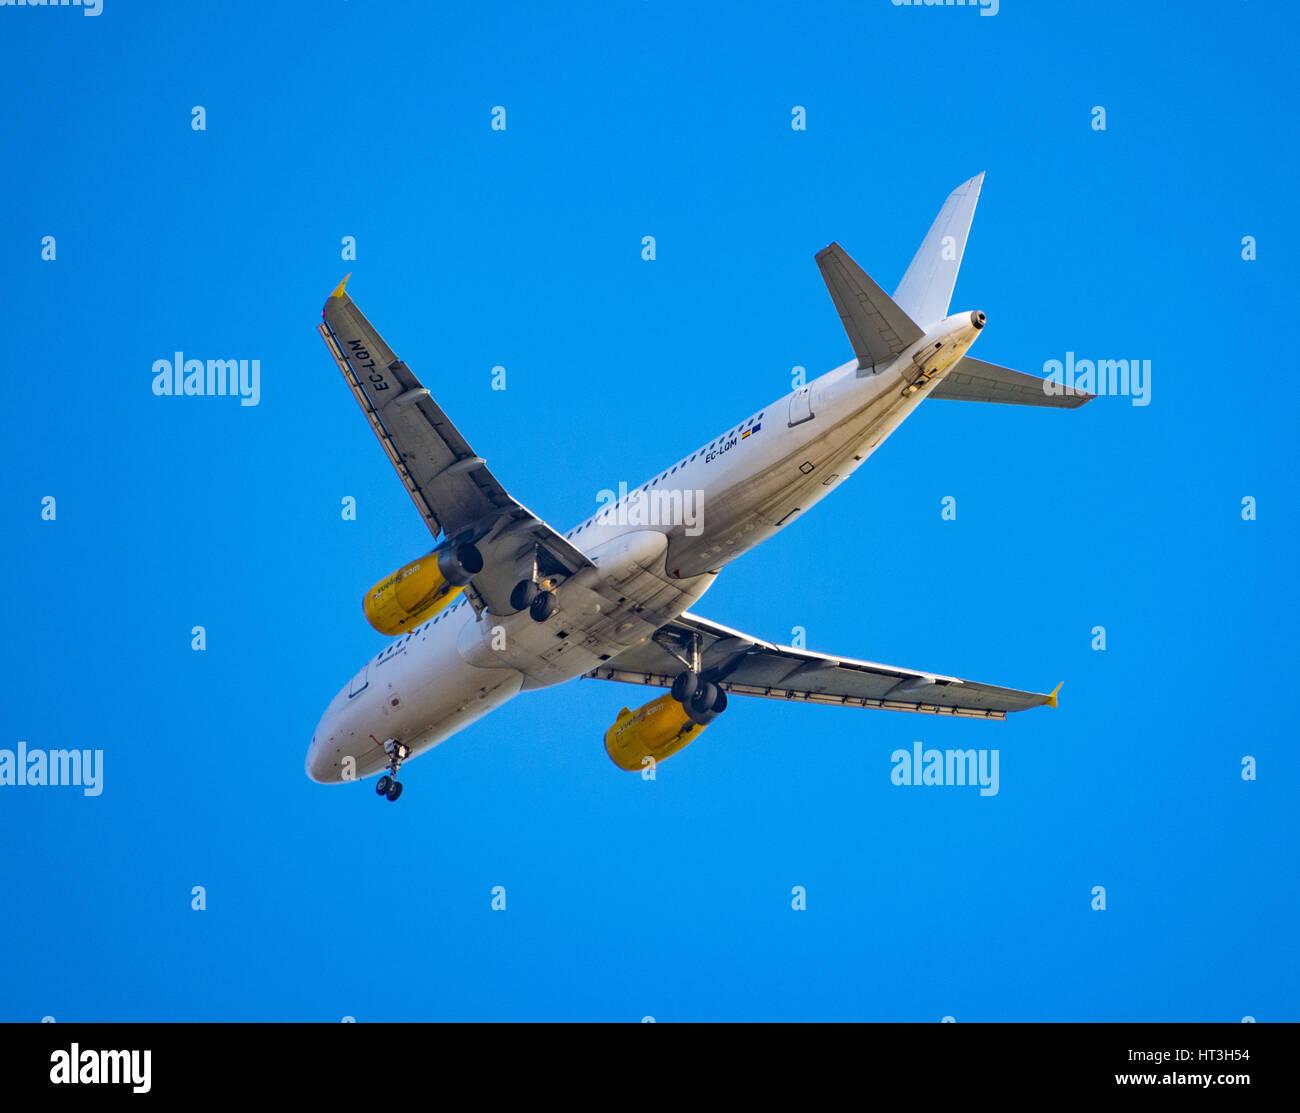 Vueling Airbus A320 - landing at Barcelona El Prat - Stock Image